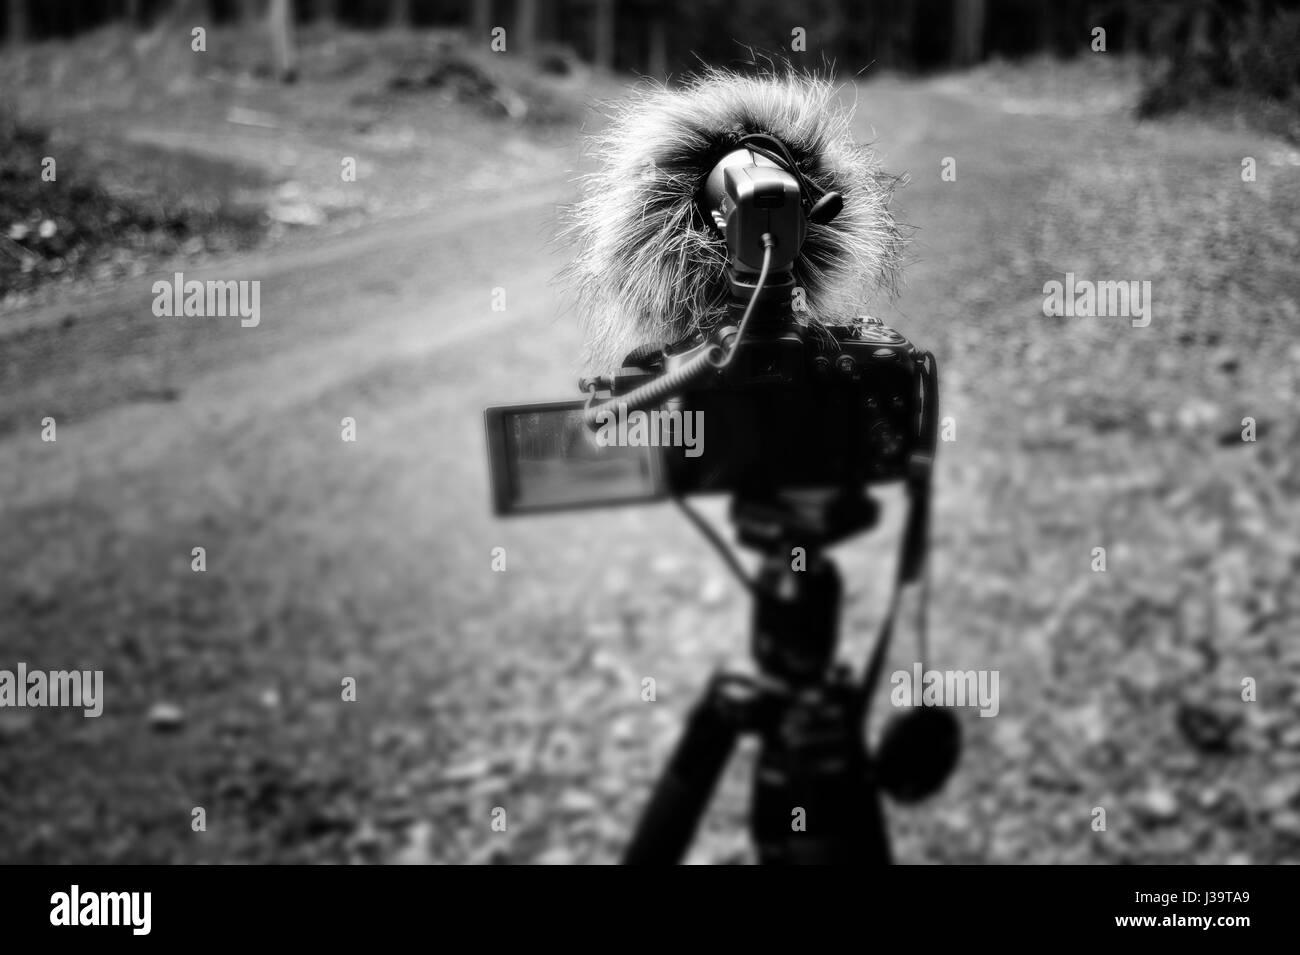 Behind-the-scenes: MTB video documentary - Stock-Bilder